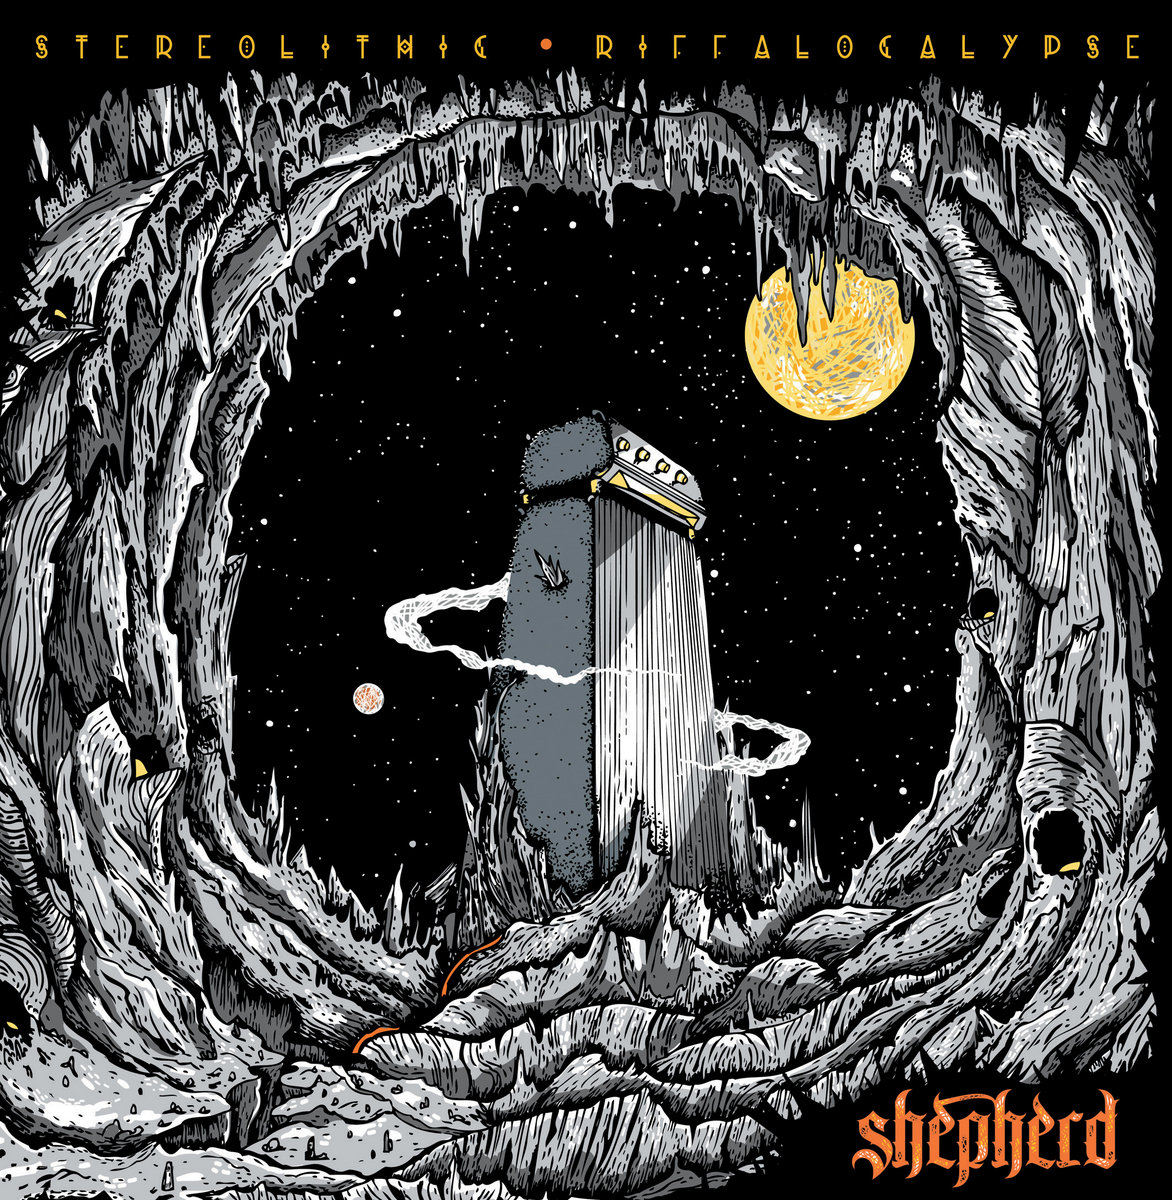 Stereolithic Riffalocalypse | SHEPHERD